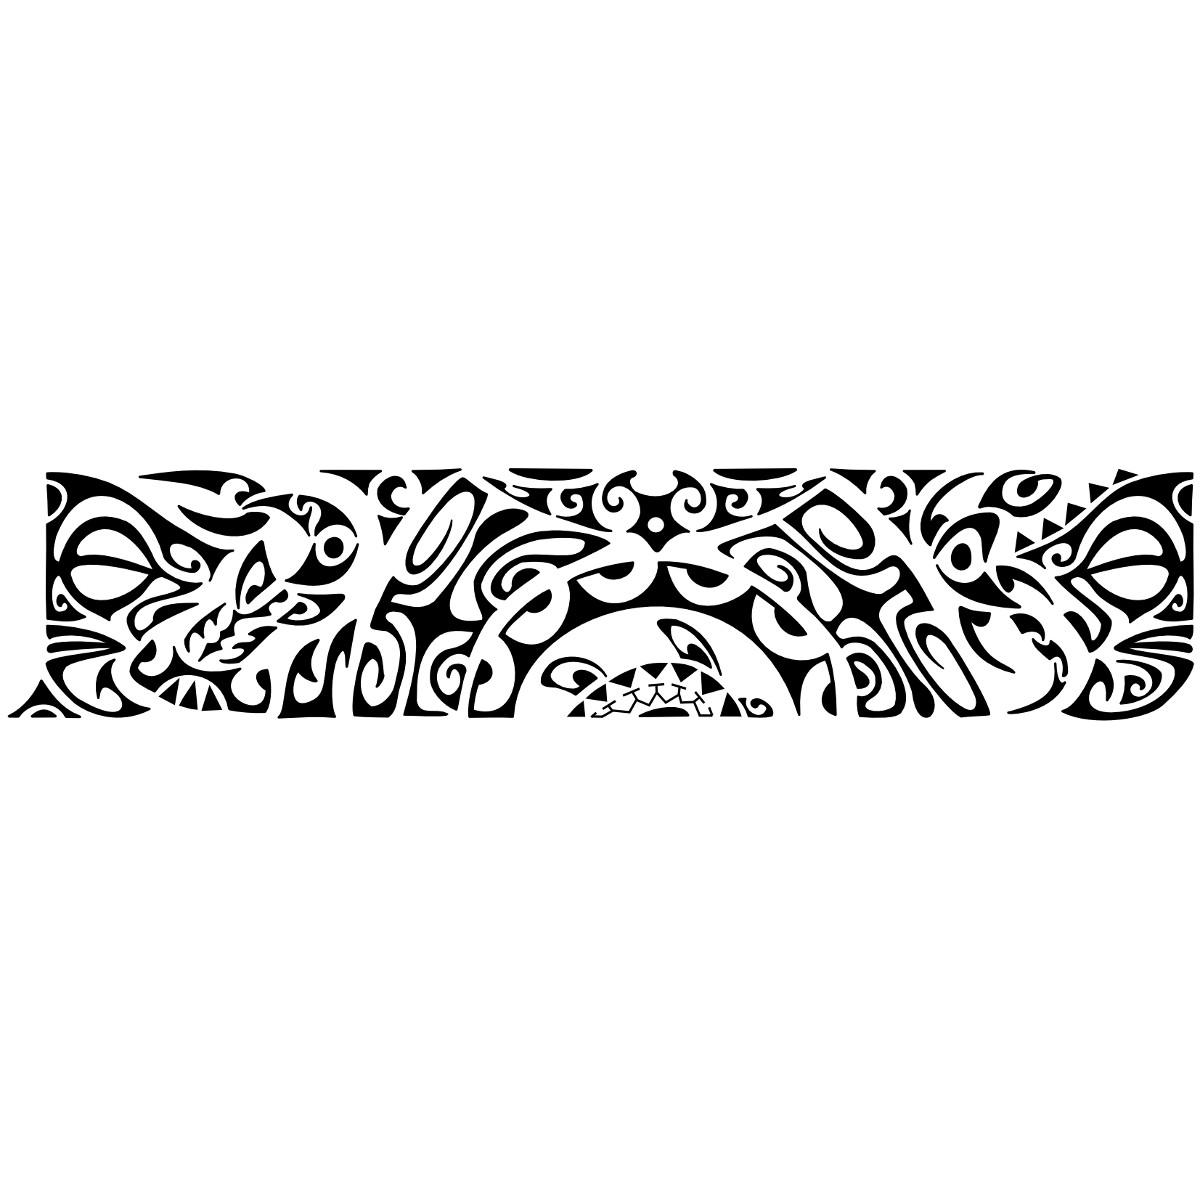 Polynesian Armband Tattoos for Men